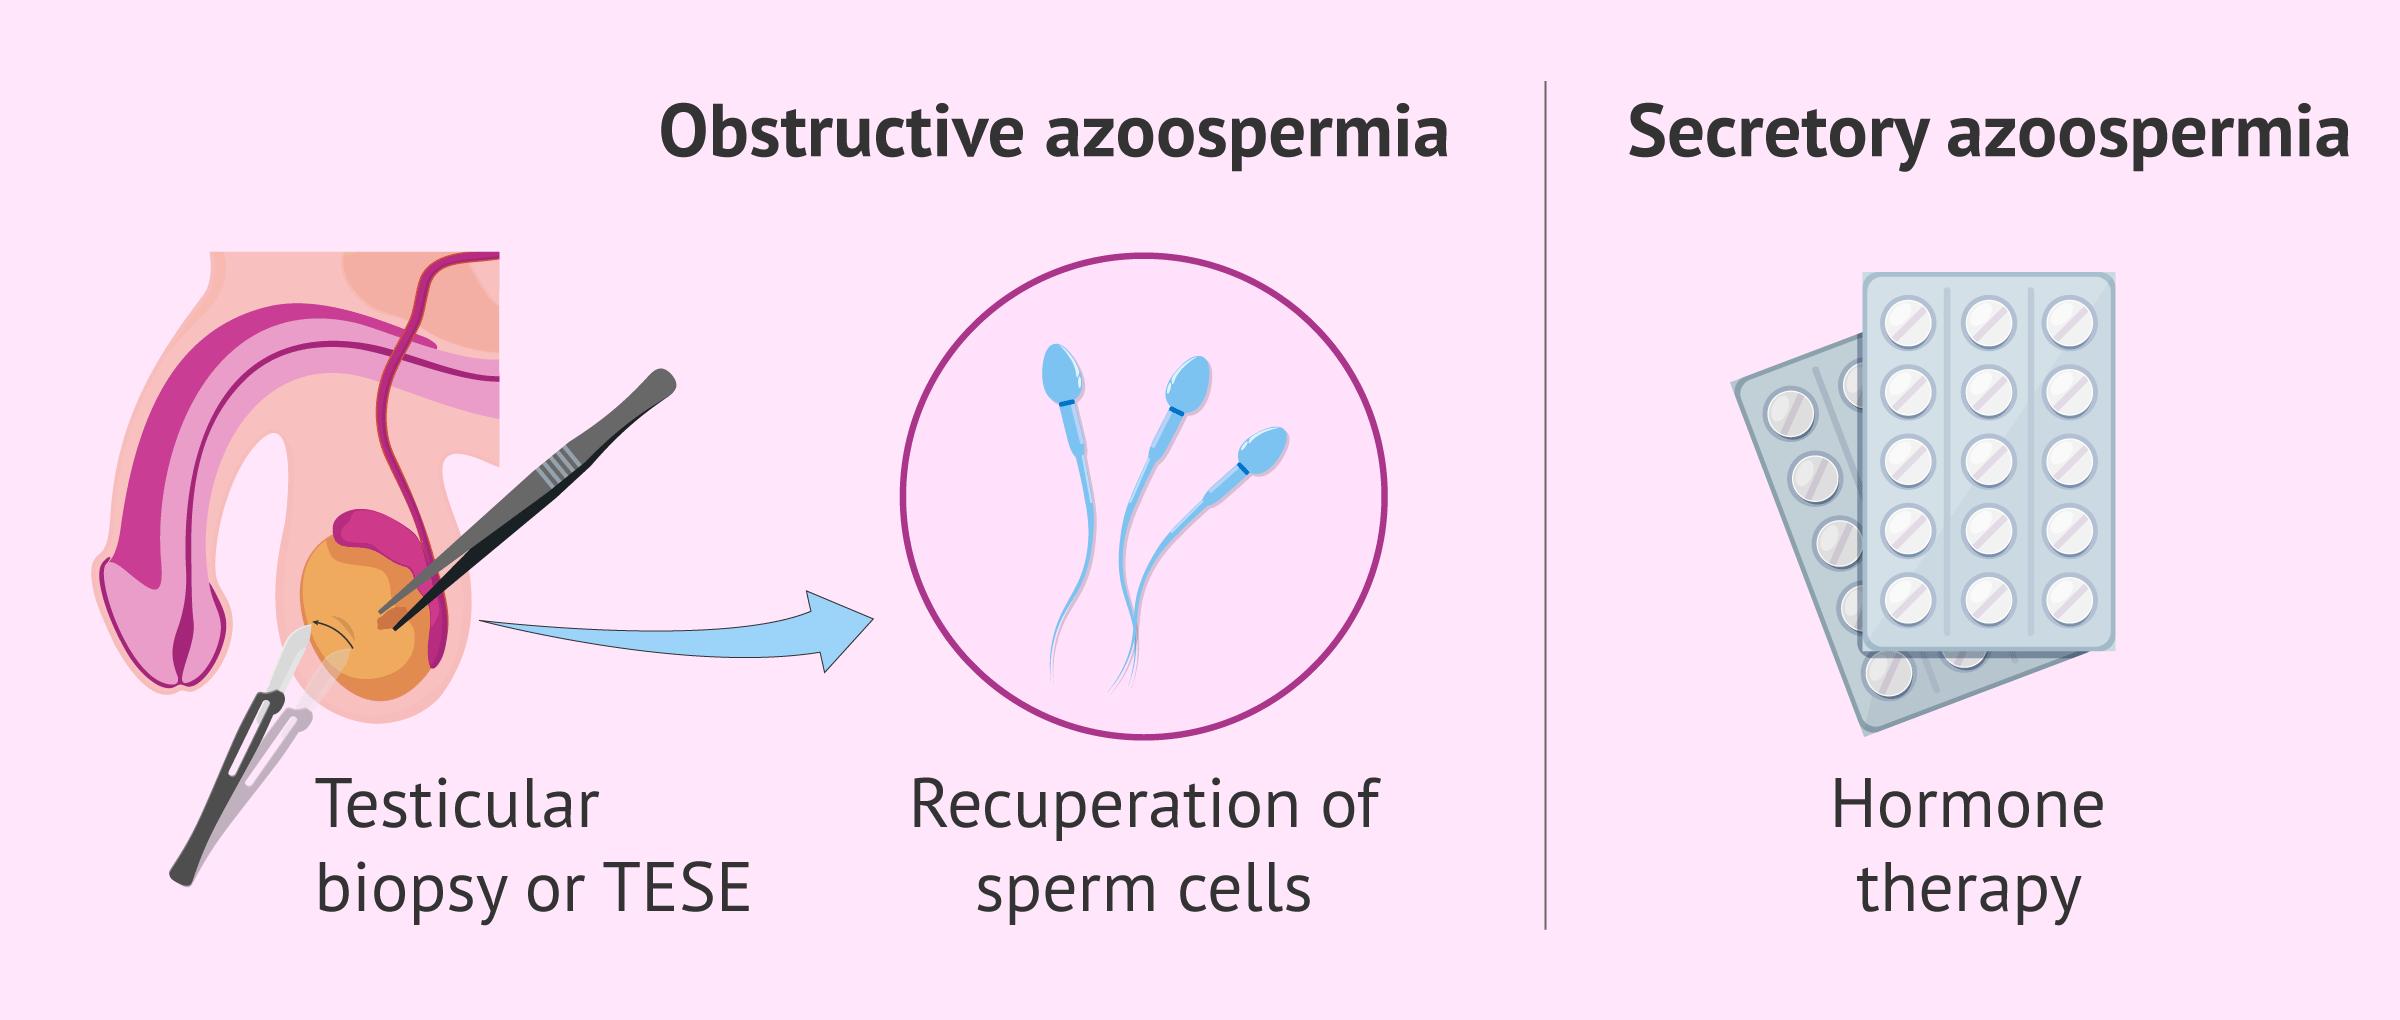 Medical treatment for azoospermia